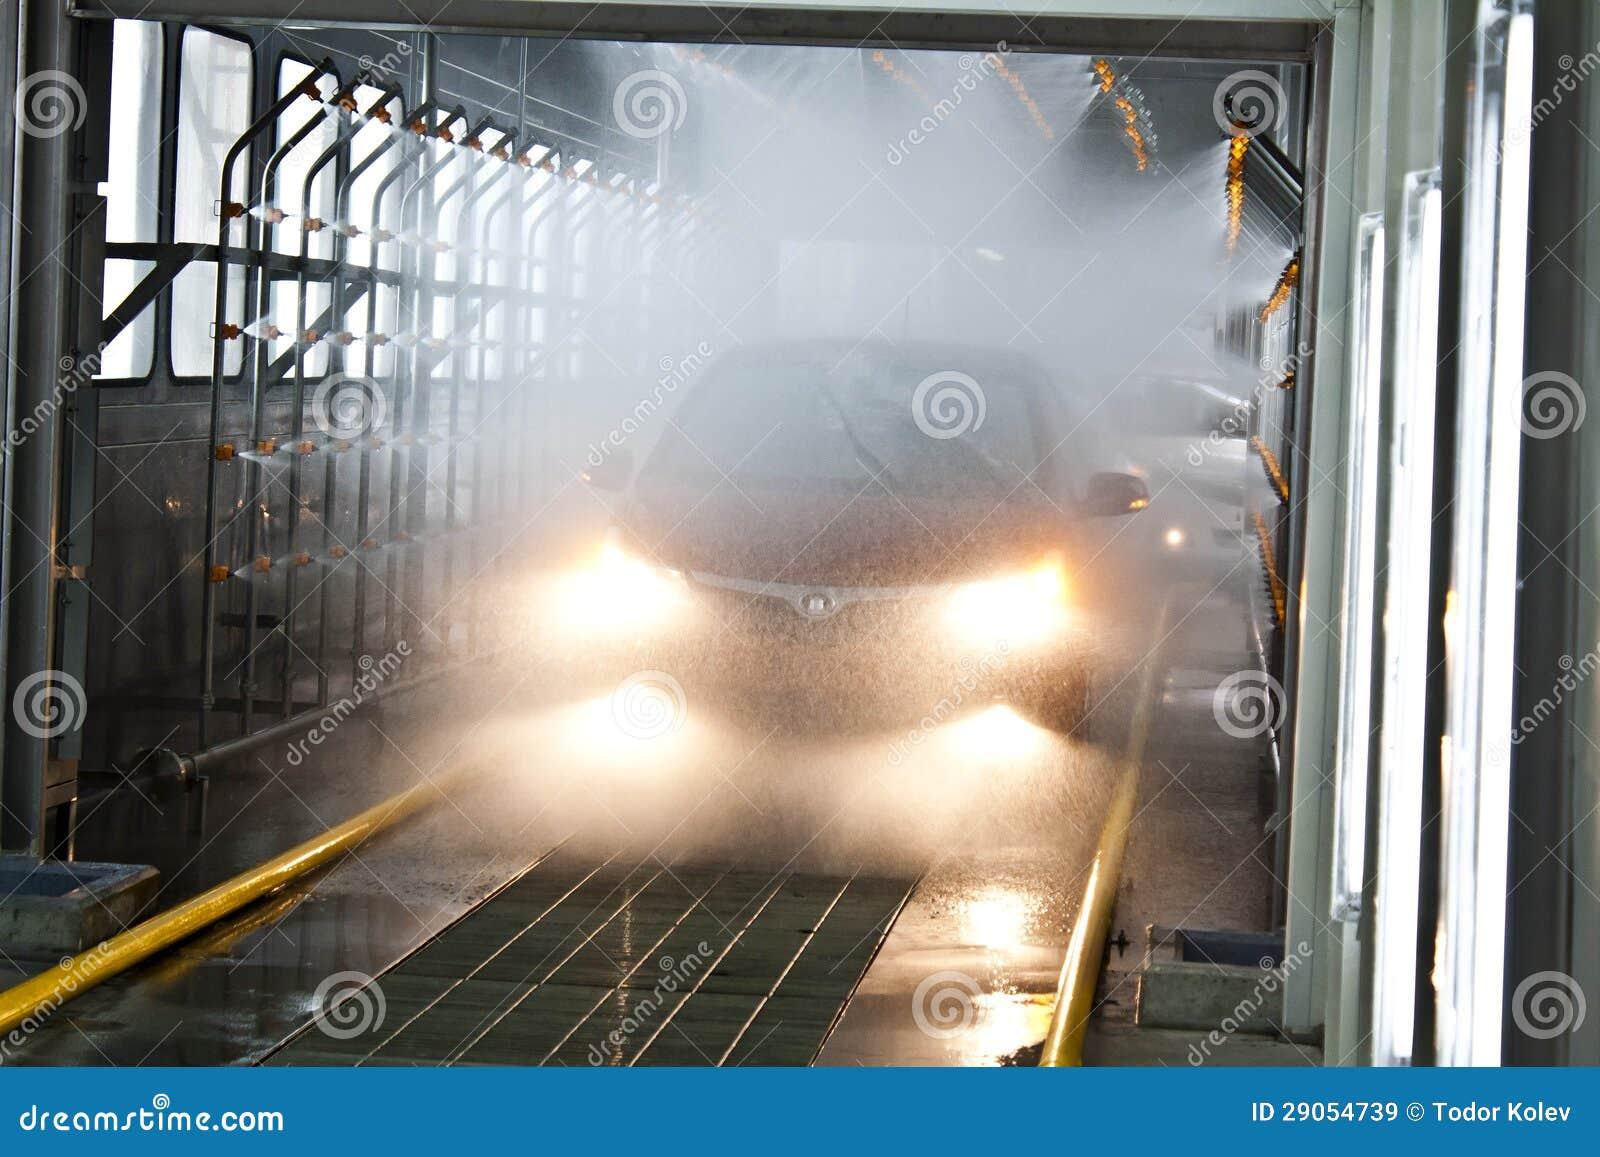 Car checking procedure